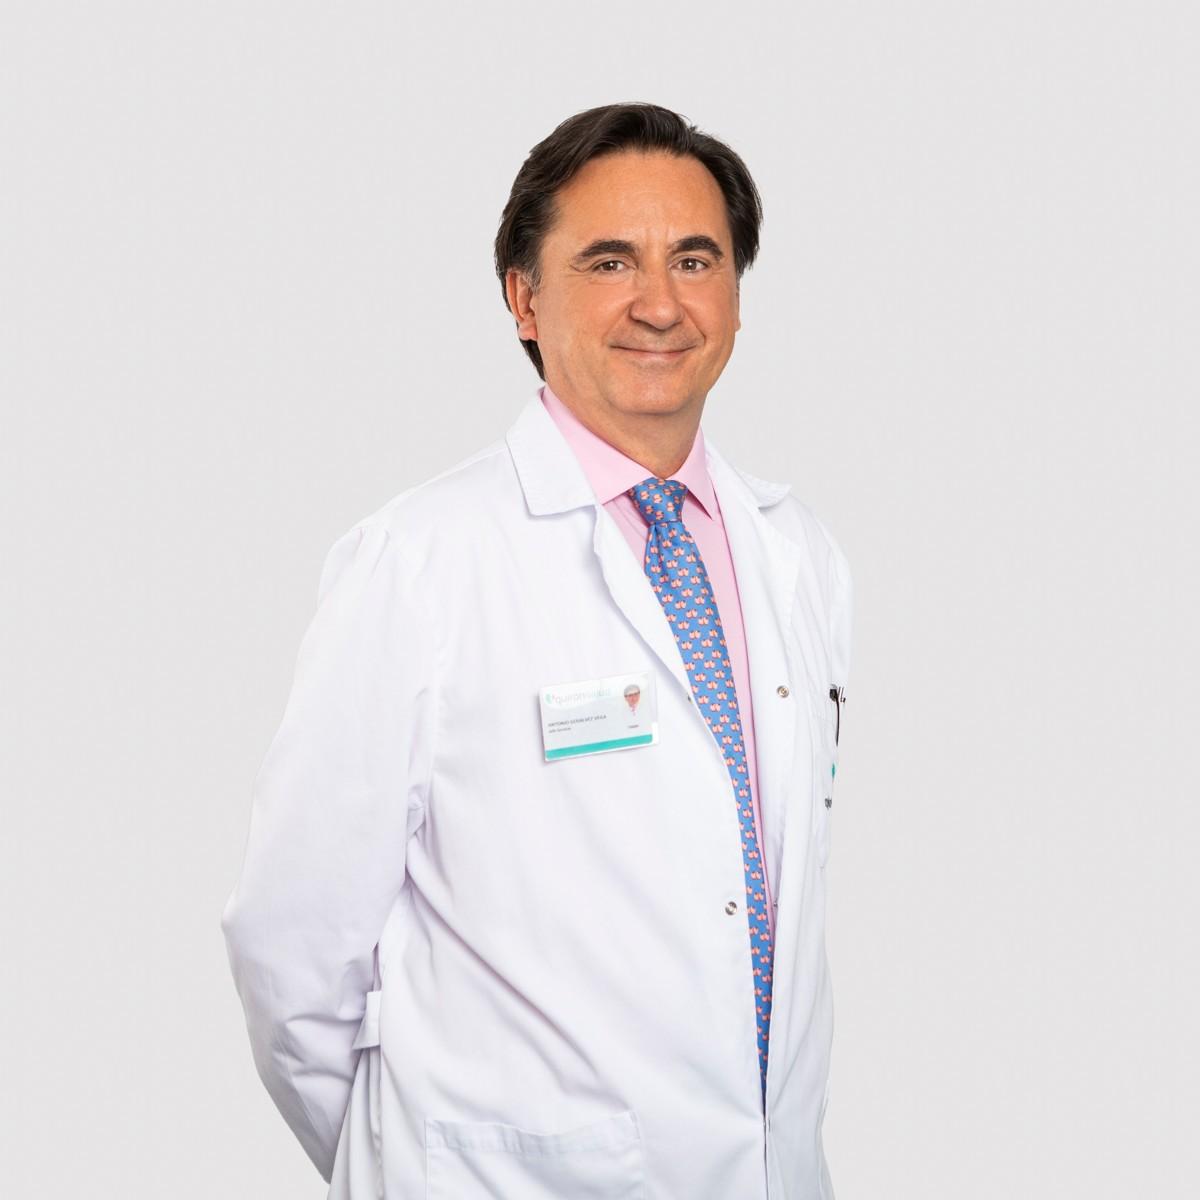 Antonio Gosálvez Vega, Dr.